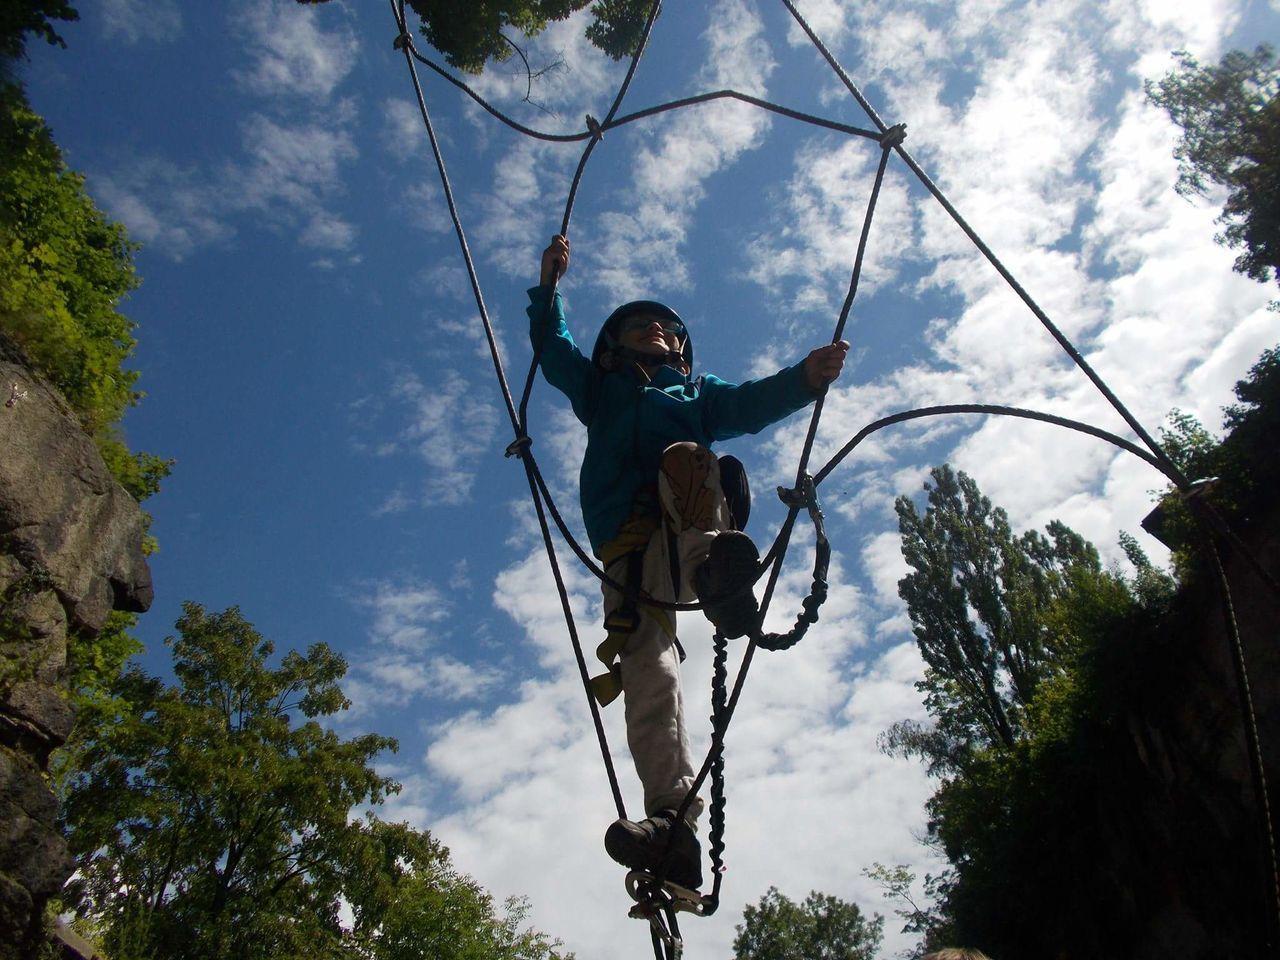 Adrenaline Adult Blue Sky Children Climbing Crazy Time Dramatic Liberec Relax Sport Via Ferrata